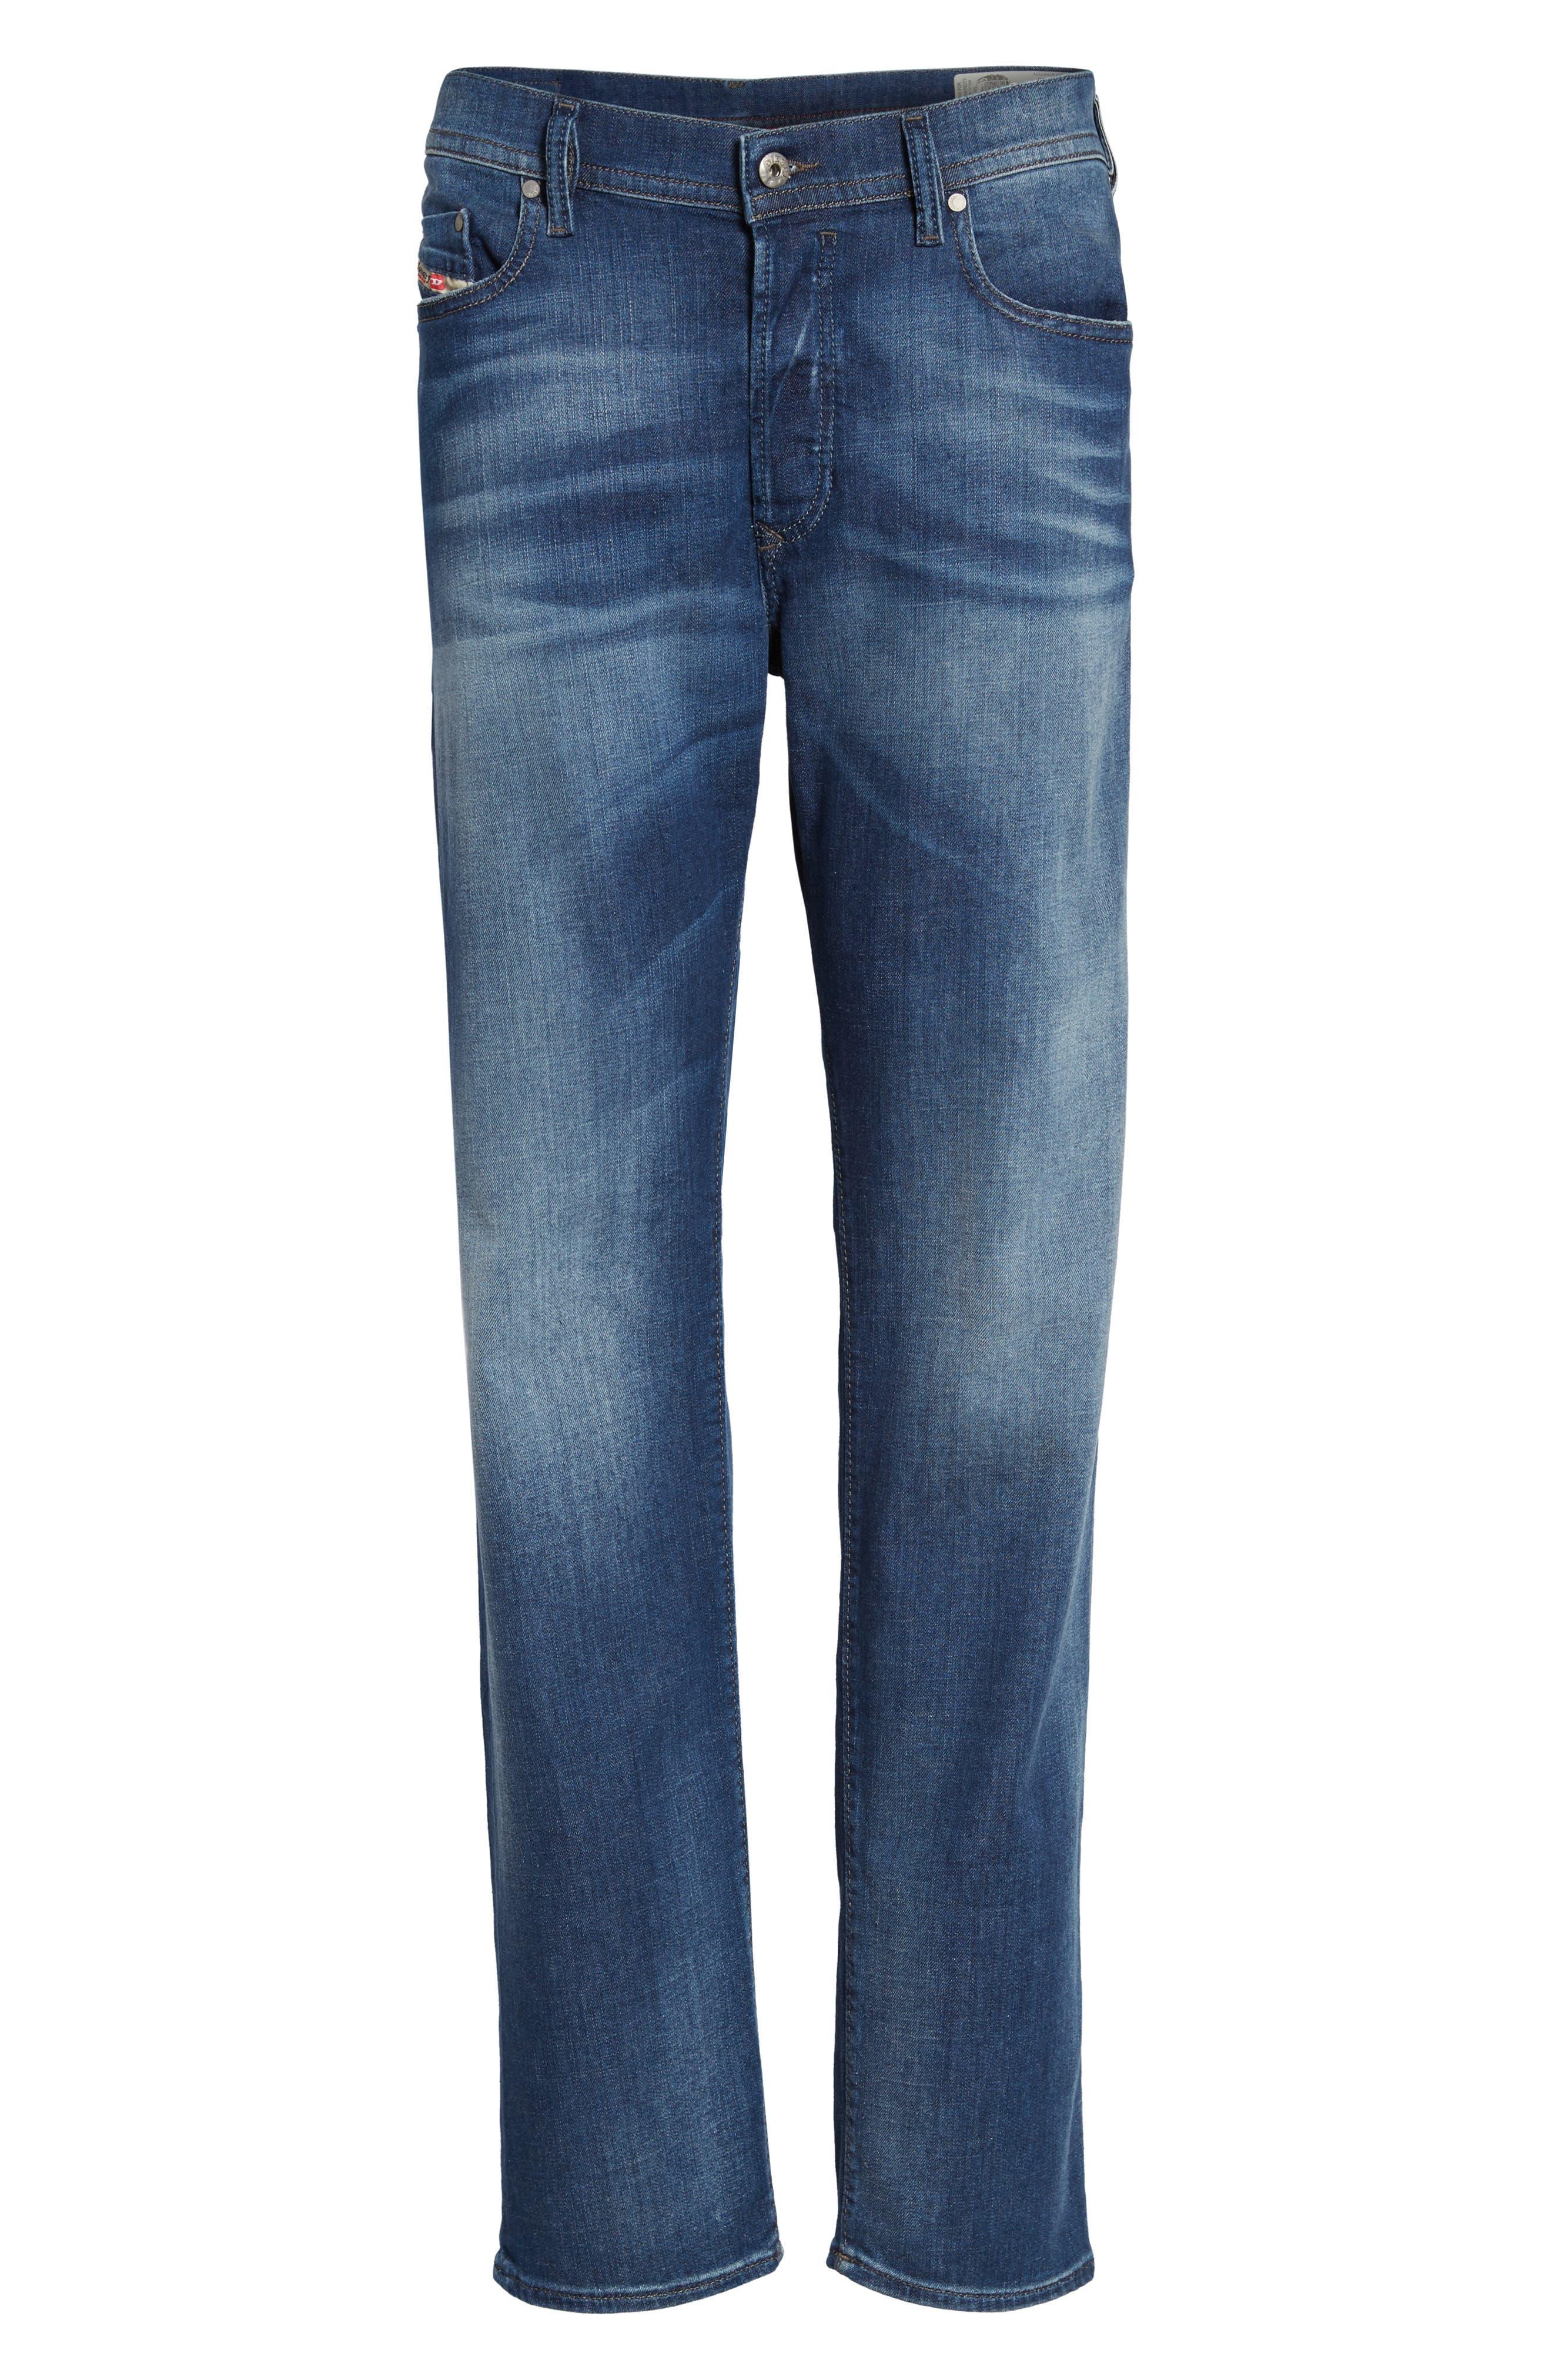 Thytan Straight Leg Jeans,                             Alternate thumbnail 6, color,                             400